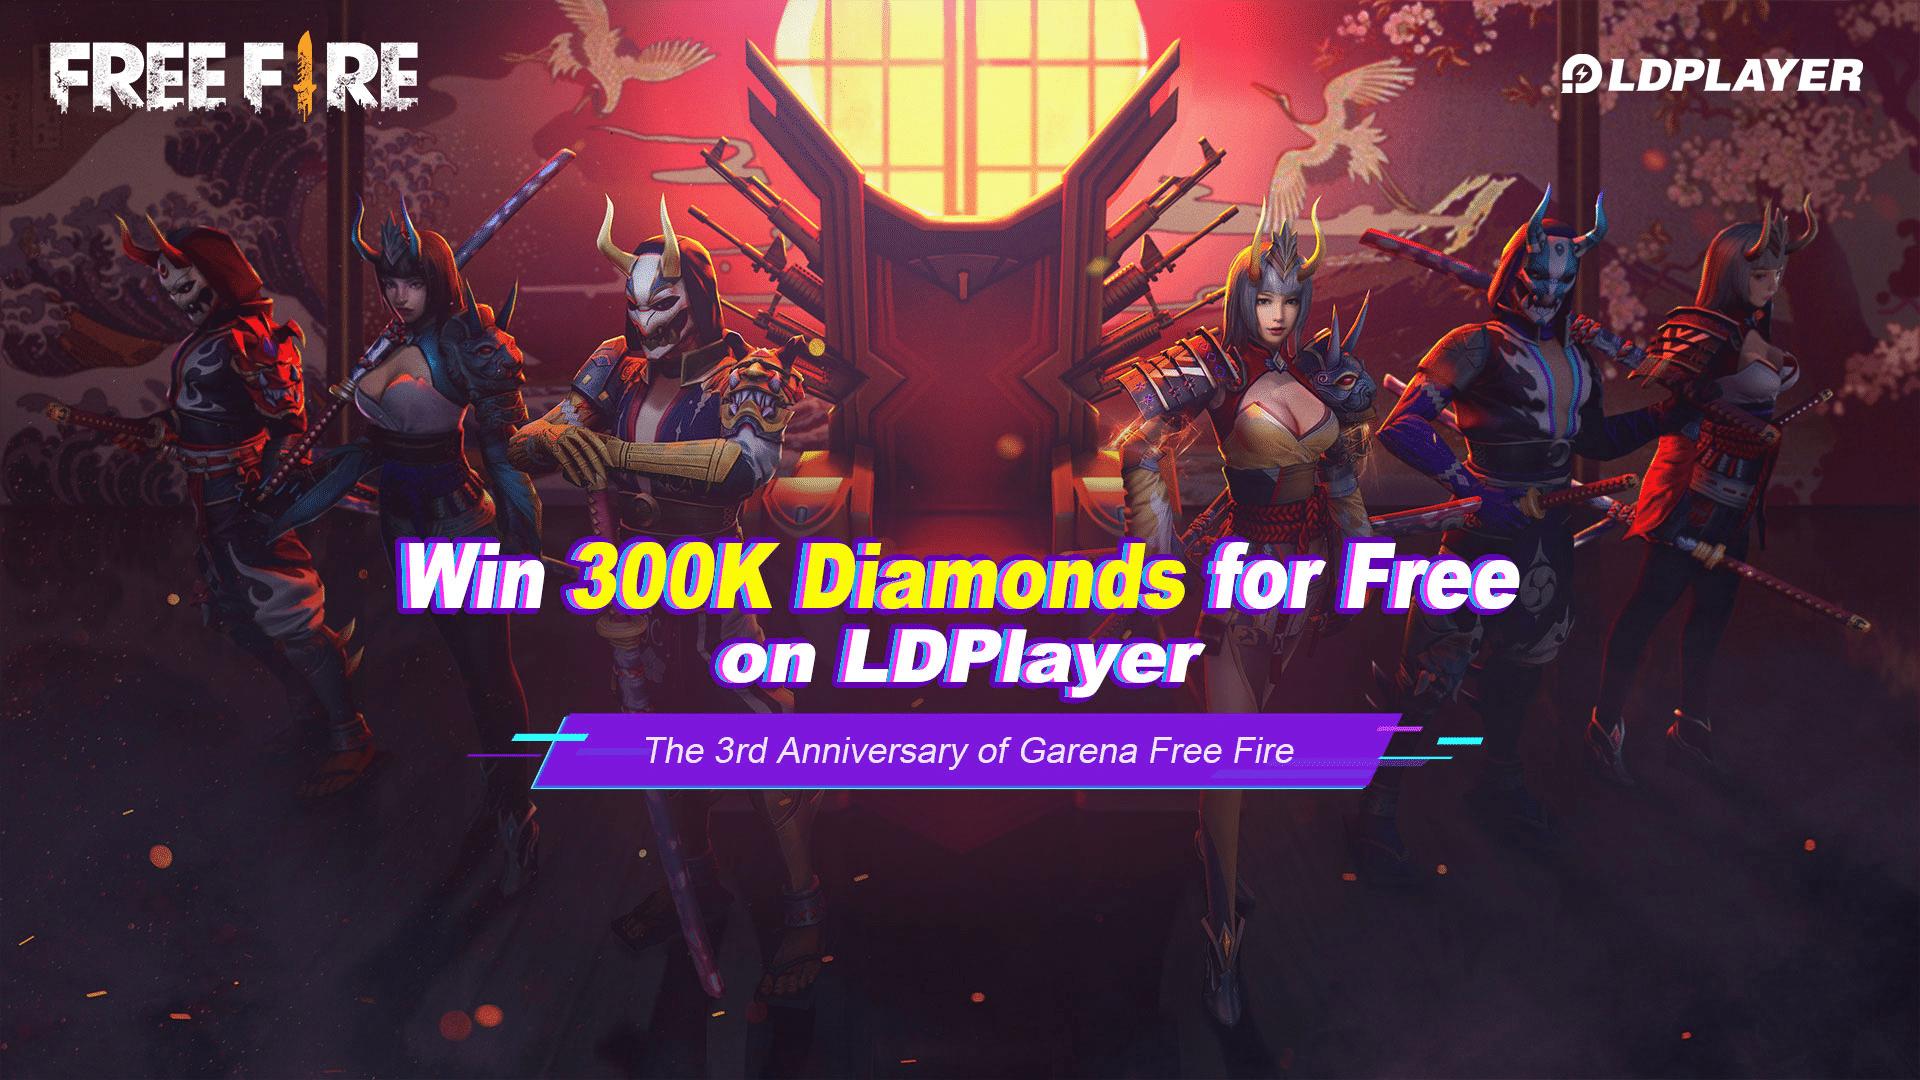 free fire ldplayer event